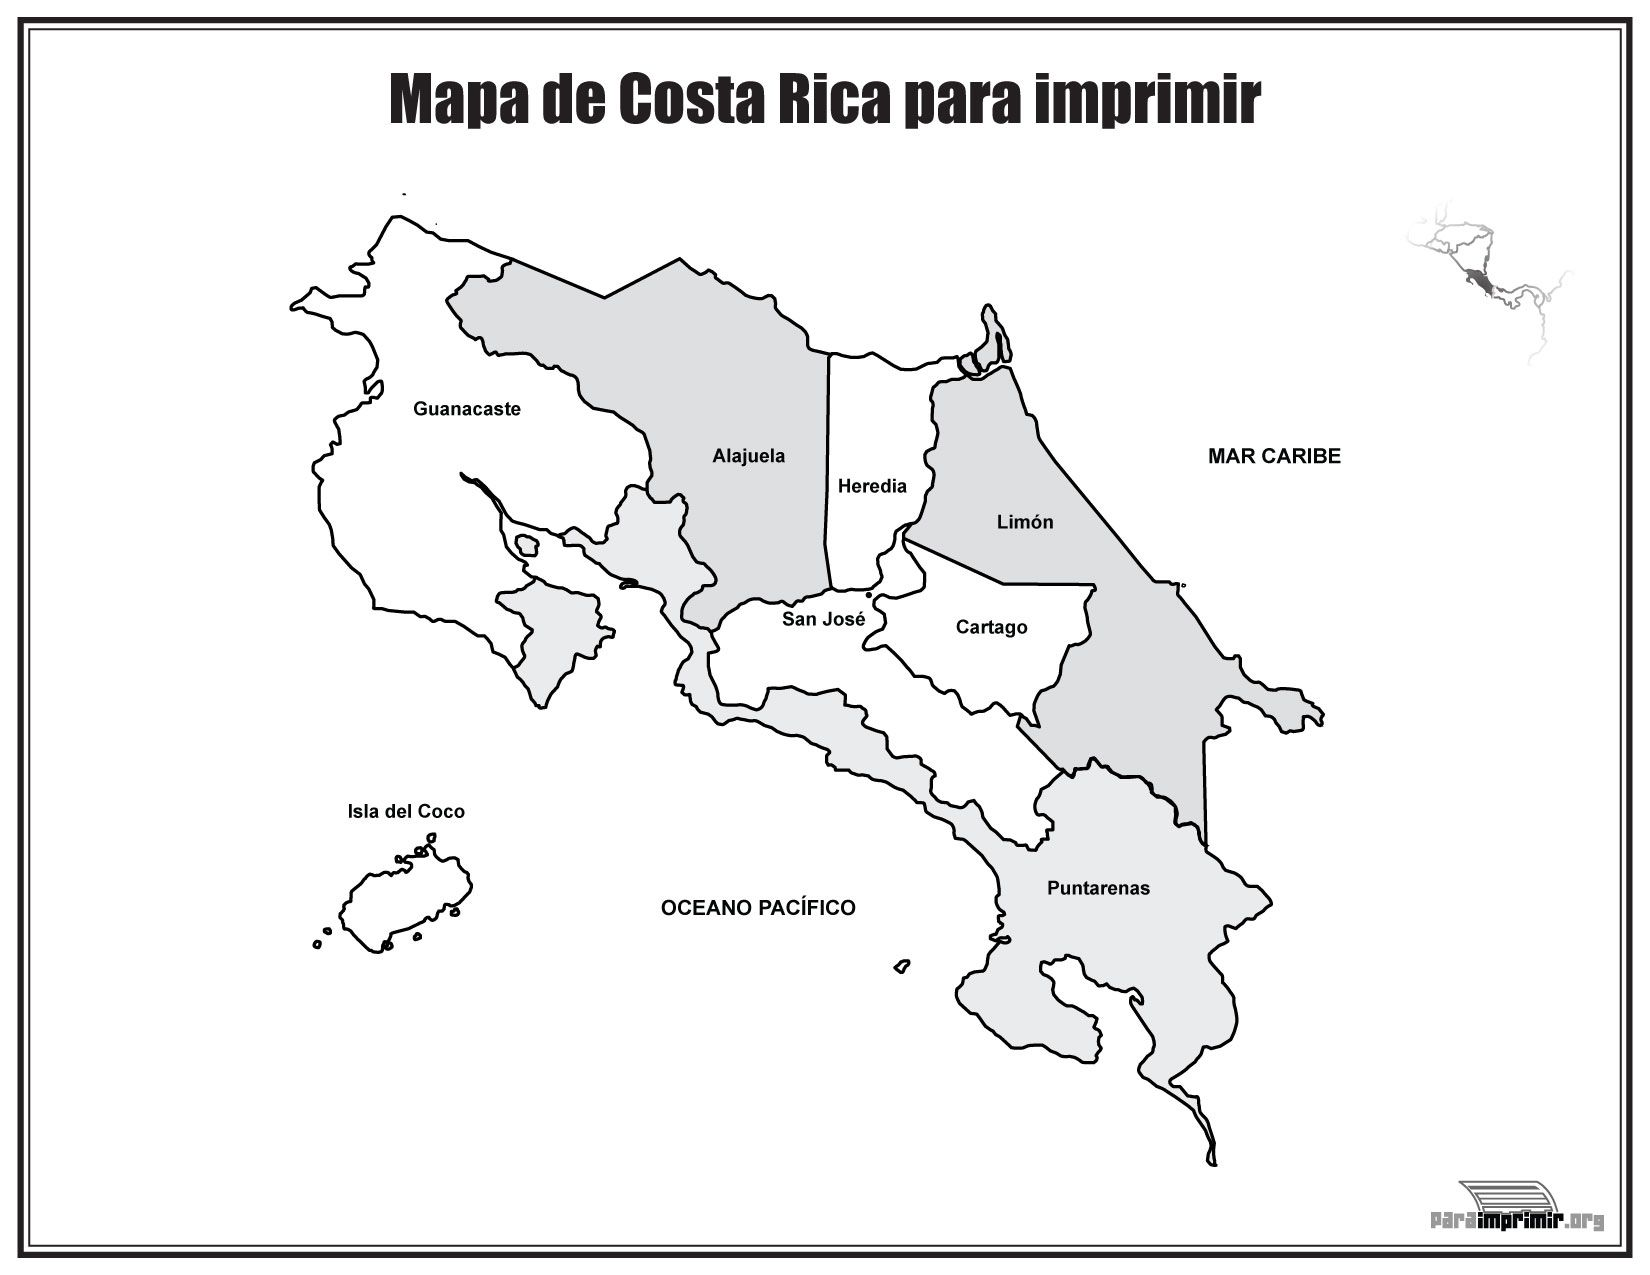 Mapa de Costa Rica con nombres para imprimir | Educación | Pinterest ...